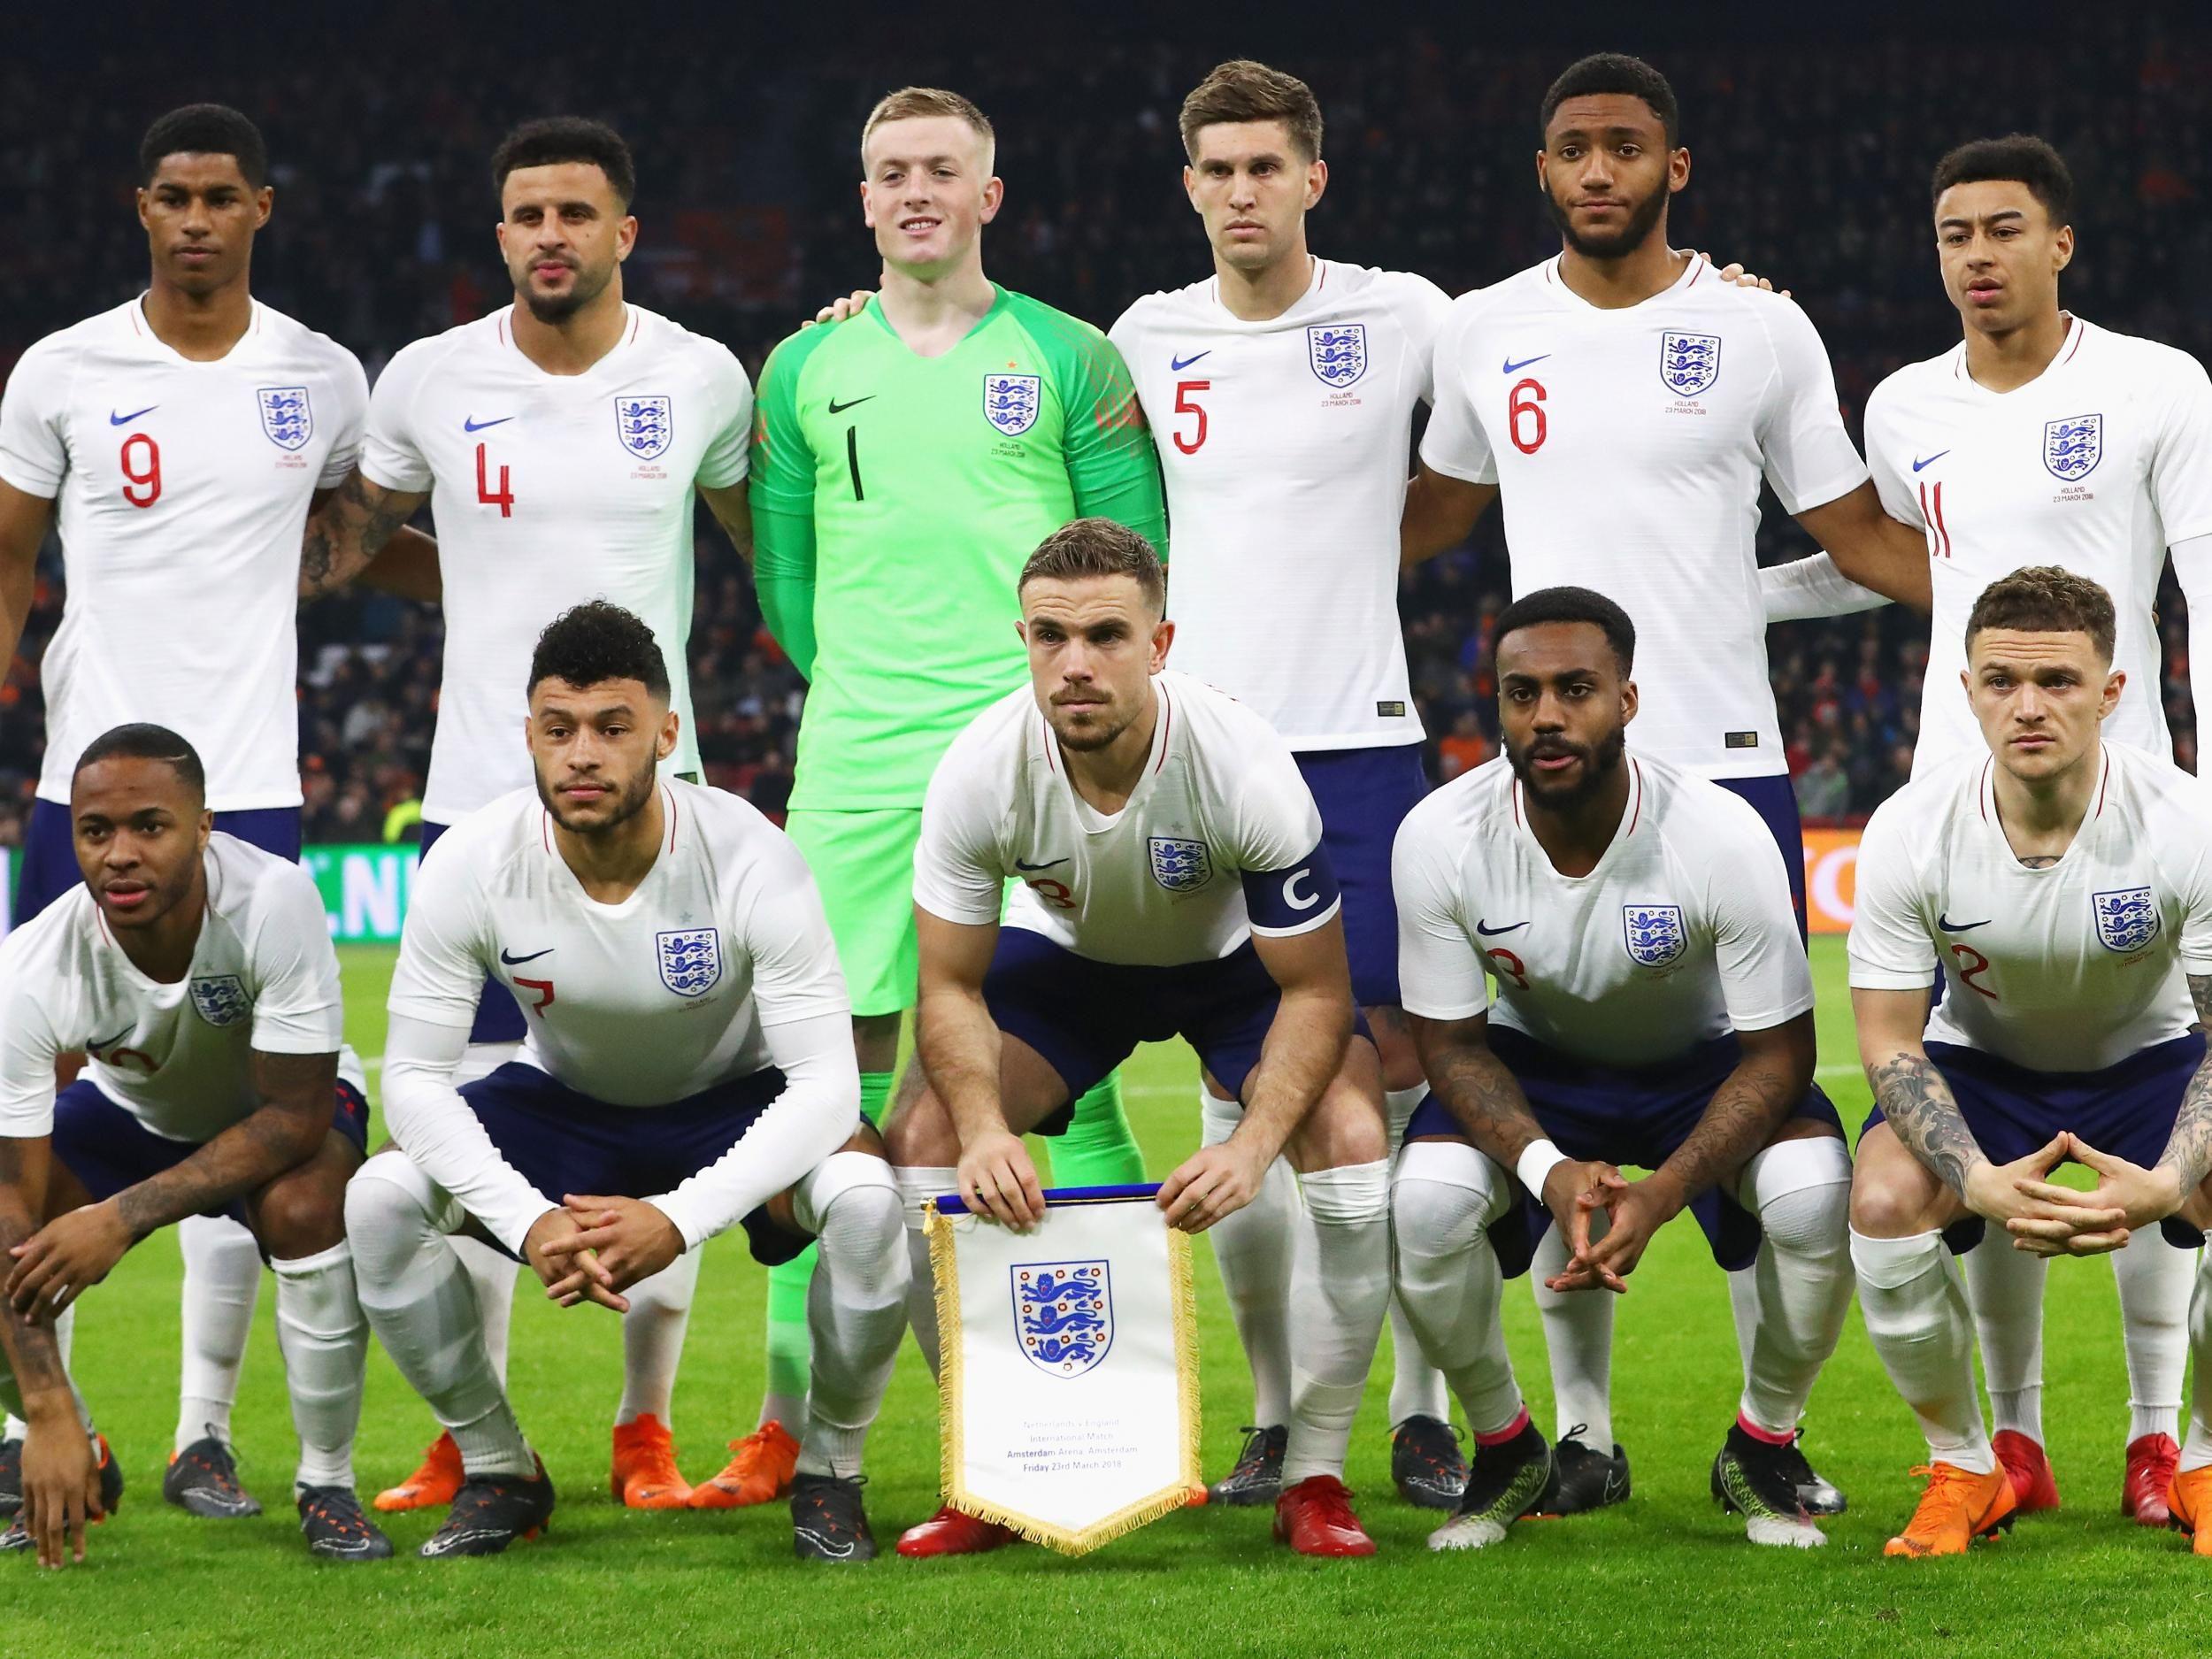 England Football Team 2018 England Football Team England Football England World Cup Team